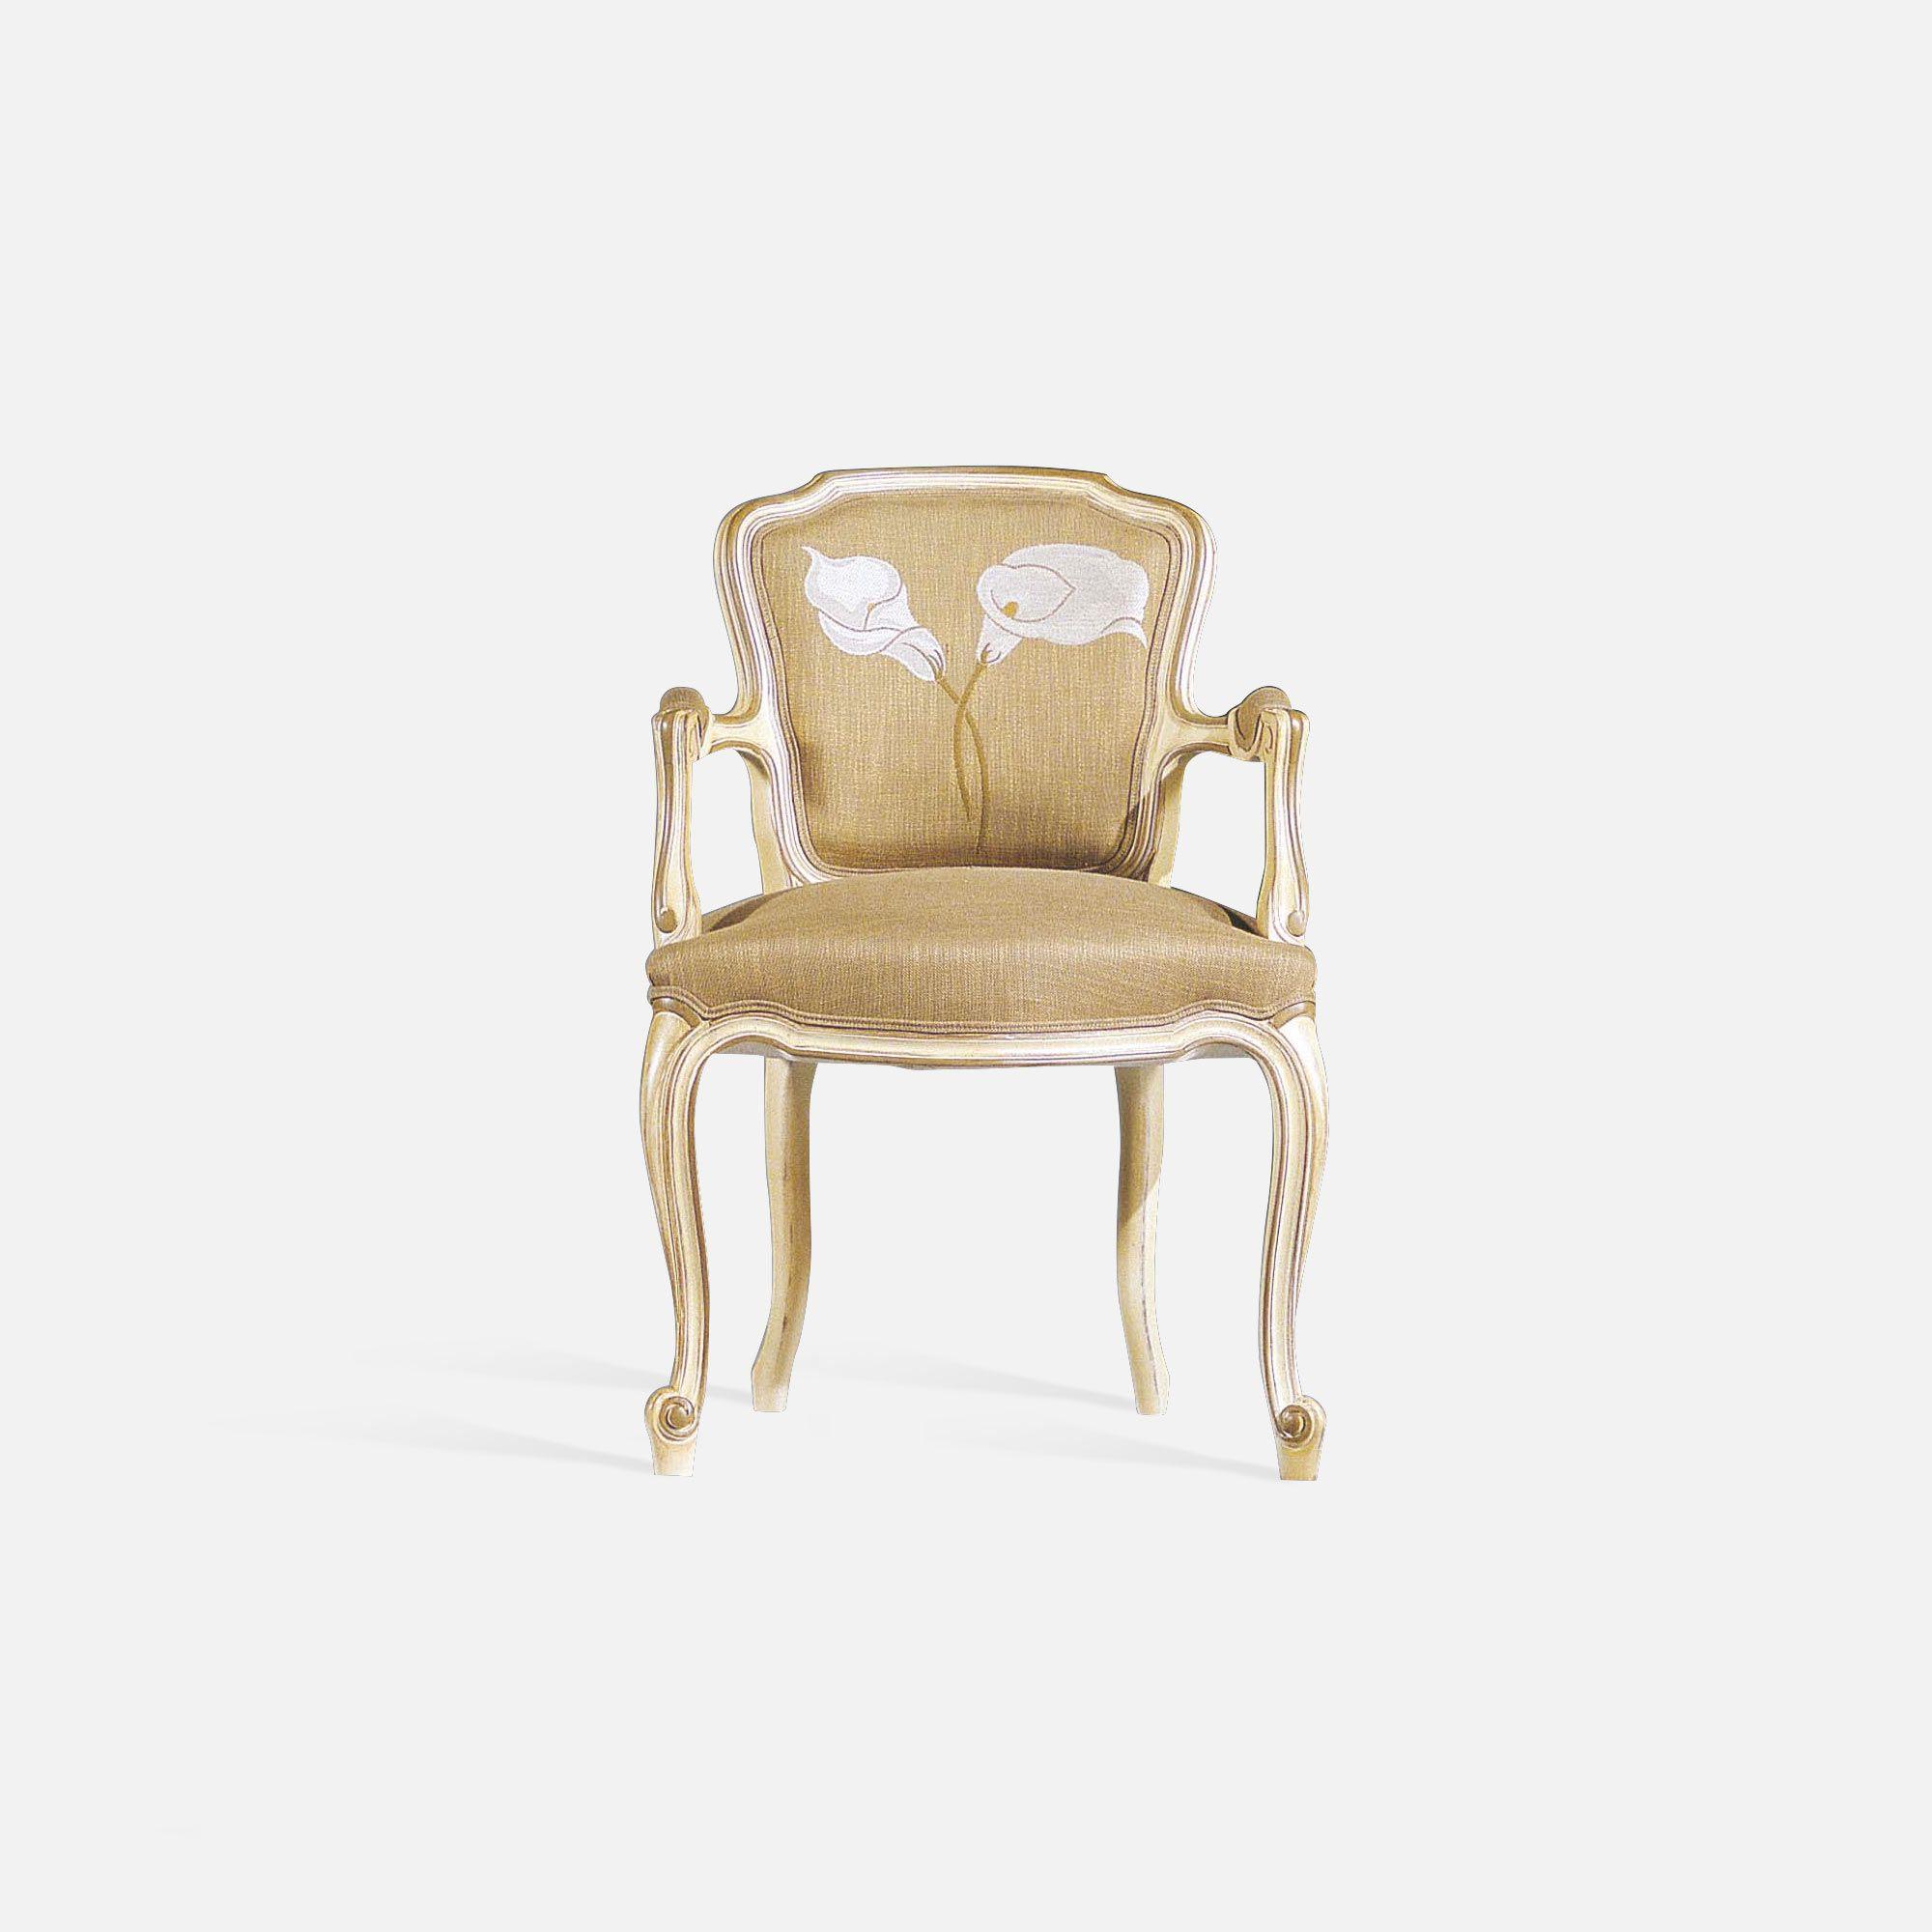 fauteuil cabriolet louis xv si ge de style tapissier. Black Bedroom Furniture Sets. Home Design Ideas